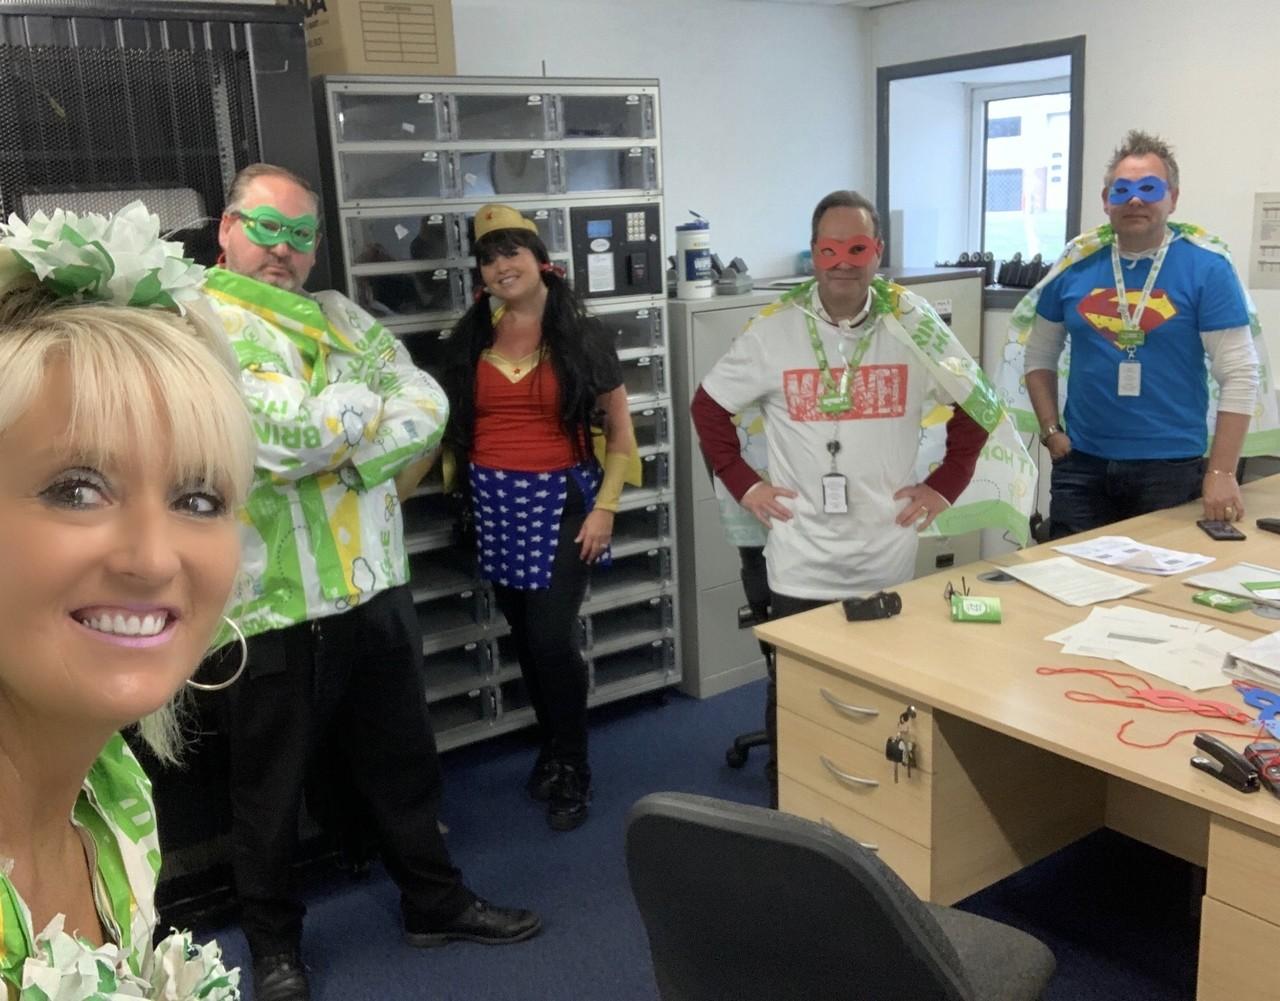 Sittingbourne superheroes | Asda Sittingbourne